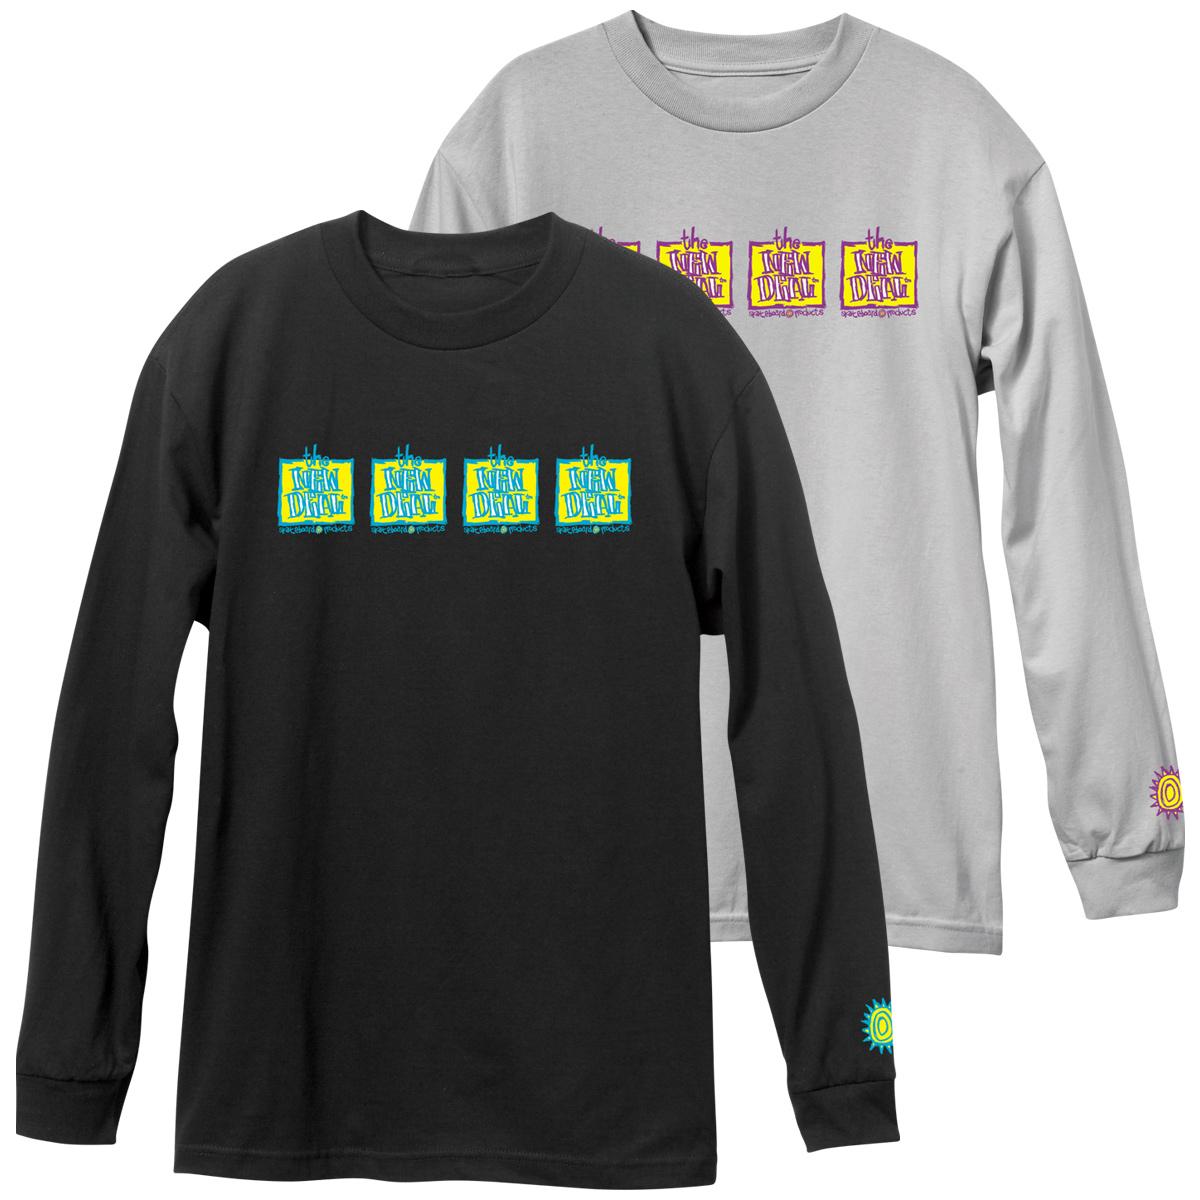 New_Deal_Skateboards_Original_Napkin_Logo_4_bar_Long_Sleeve_Tee.jpg